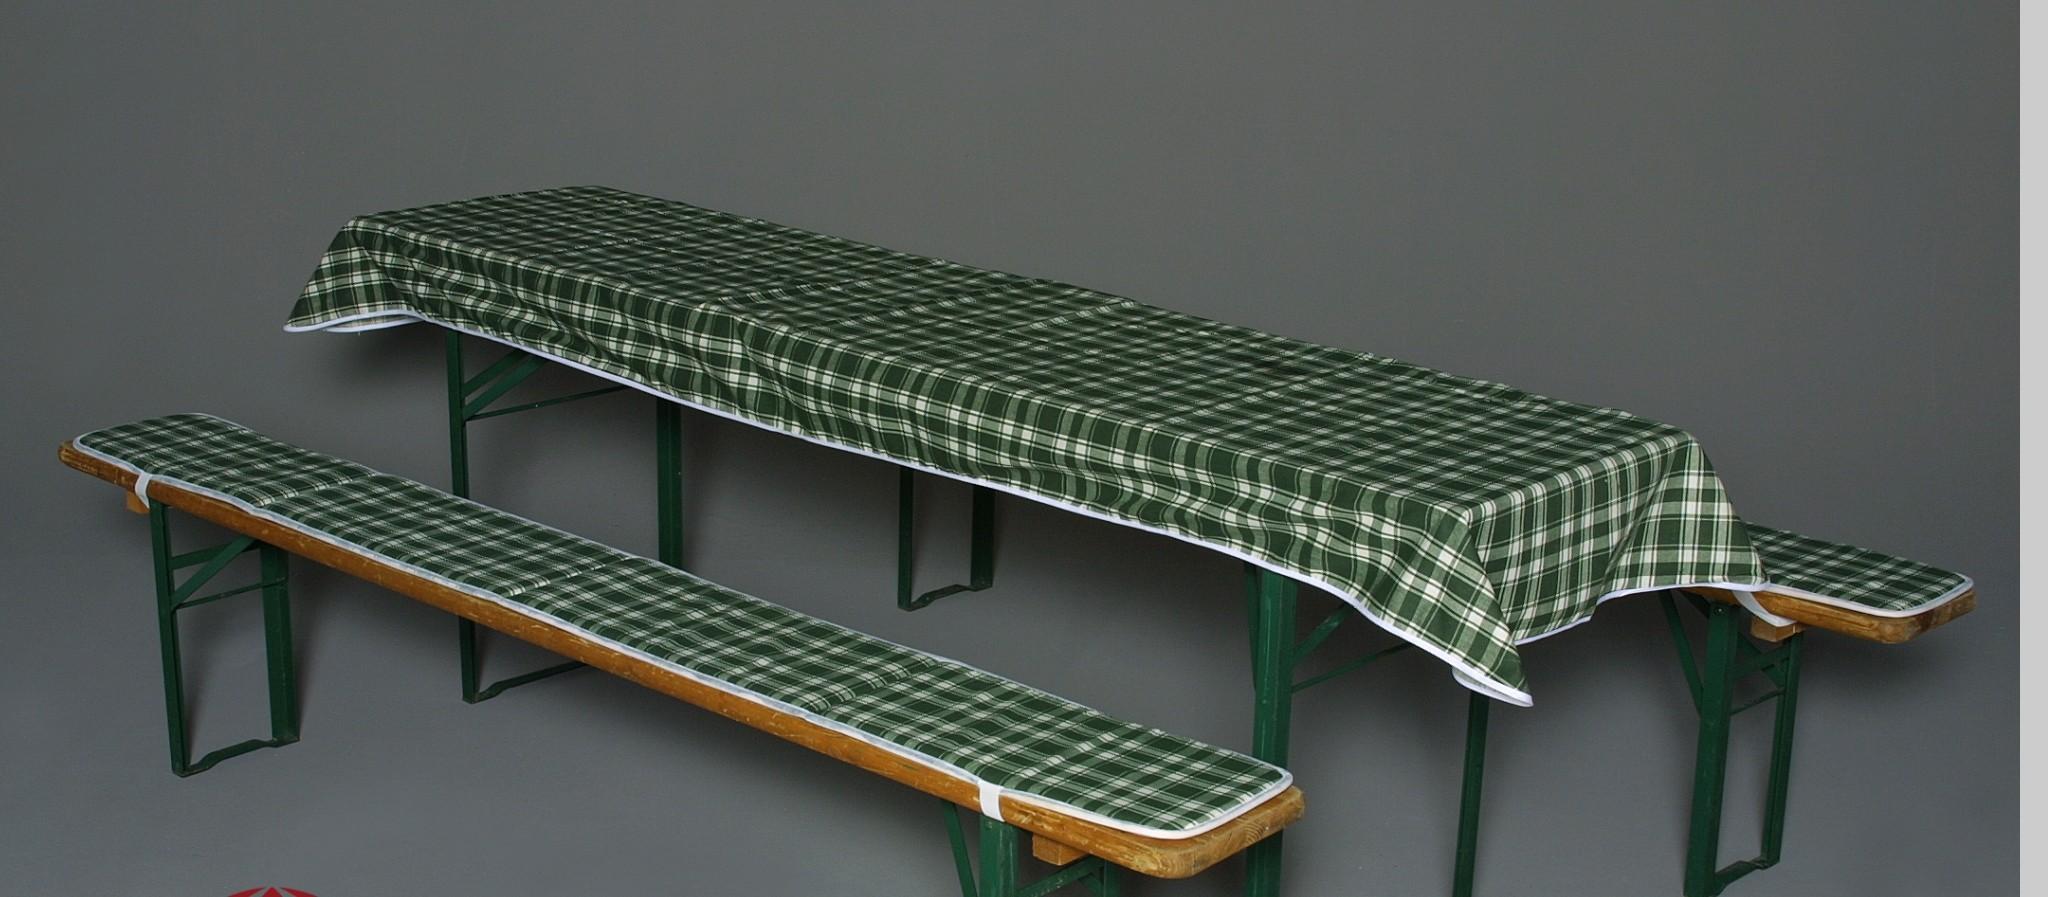 auflagen f r bierzeltgarnitur festzeltgarnitur 50cm gr n bei. Black Bedroom Furniture Sets. Home Design Ideas